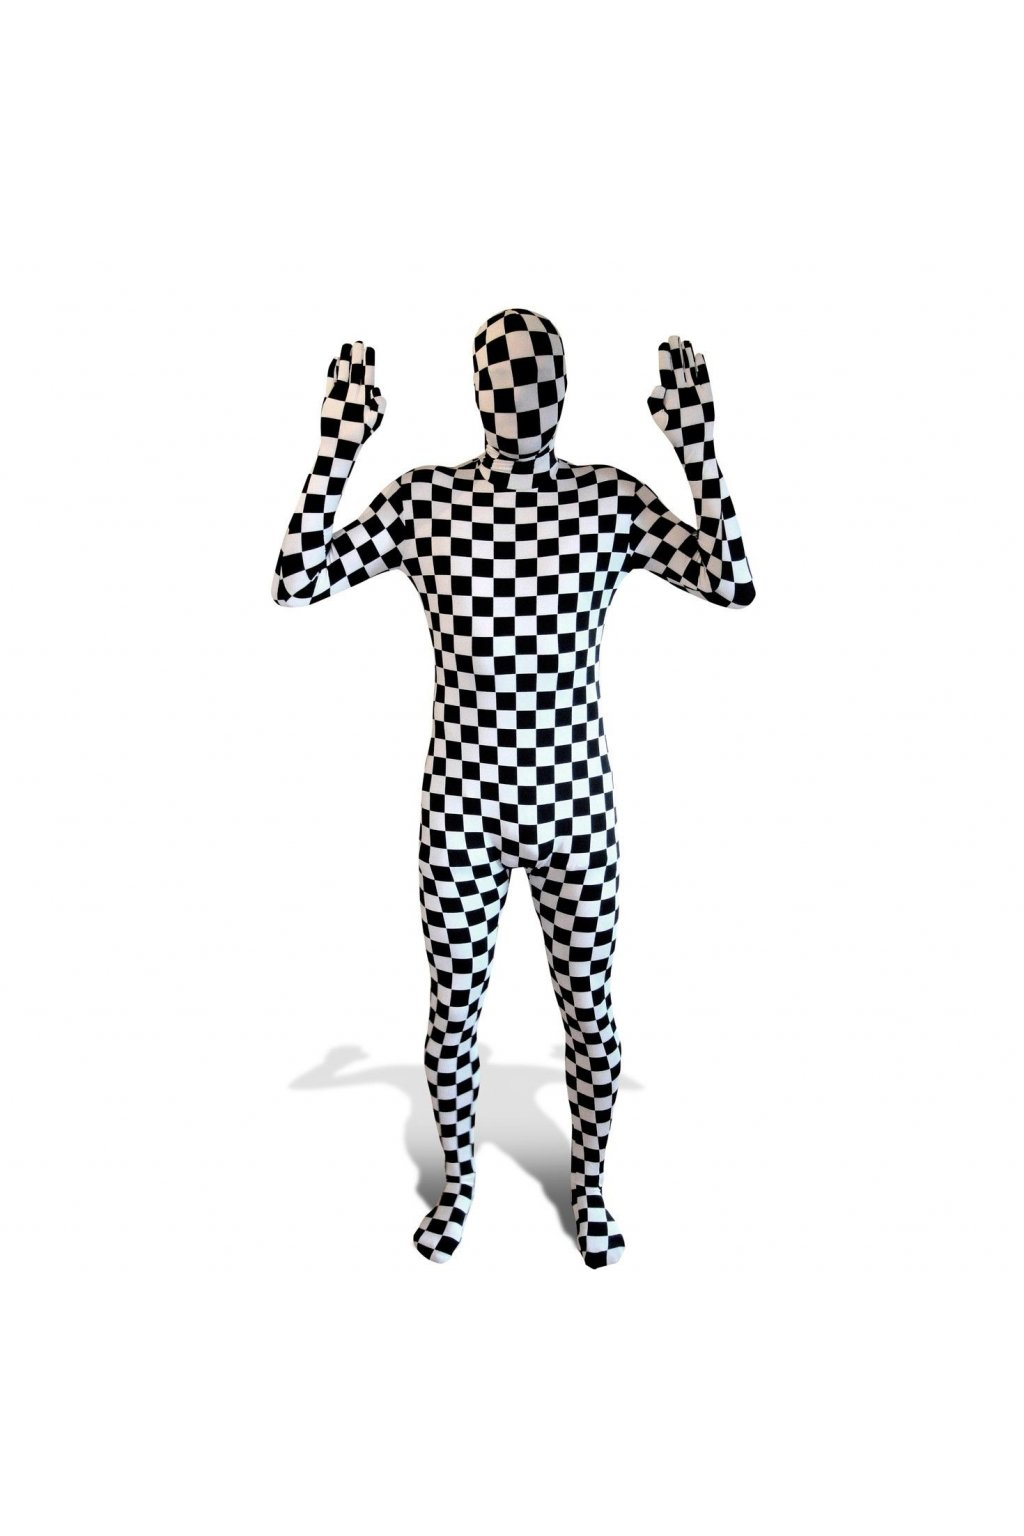 Kostým Black and White - morphsuit